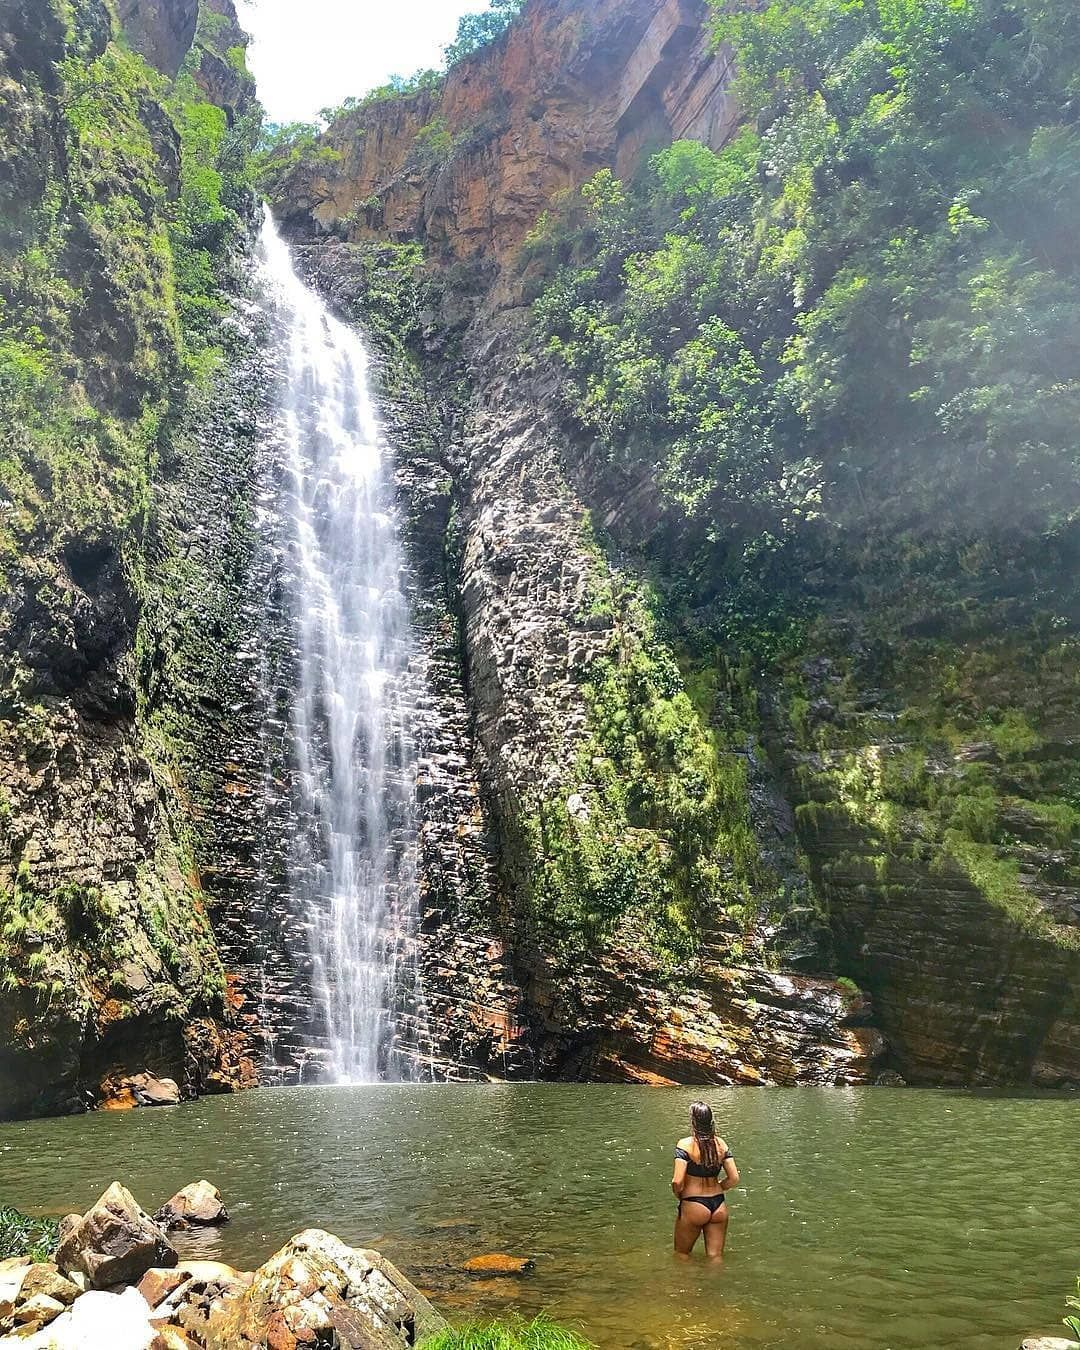 Trilheira Julianavignola Na Cachoeira Do Segredo Chapada Dos